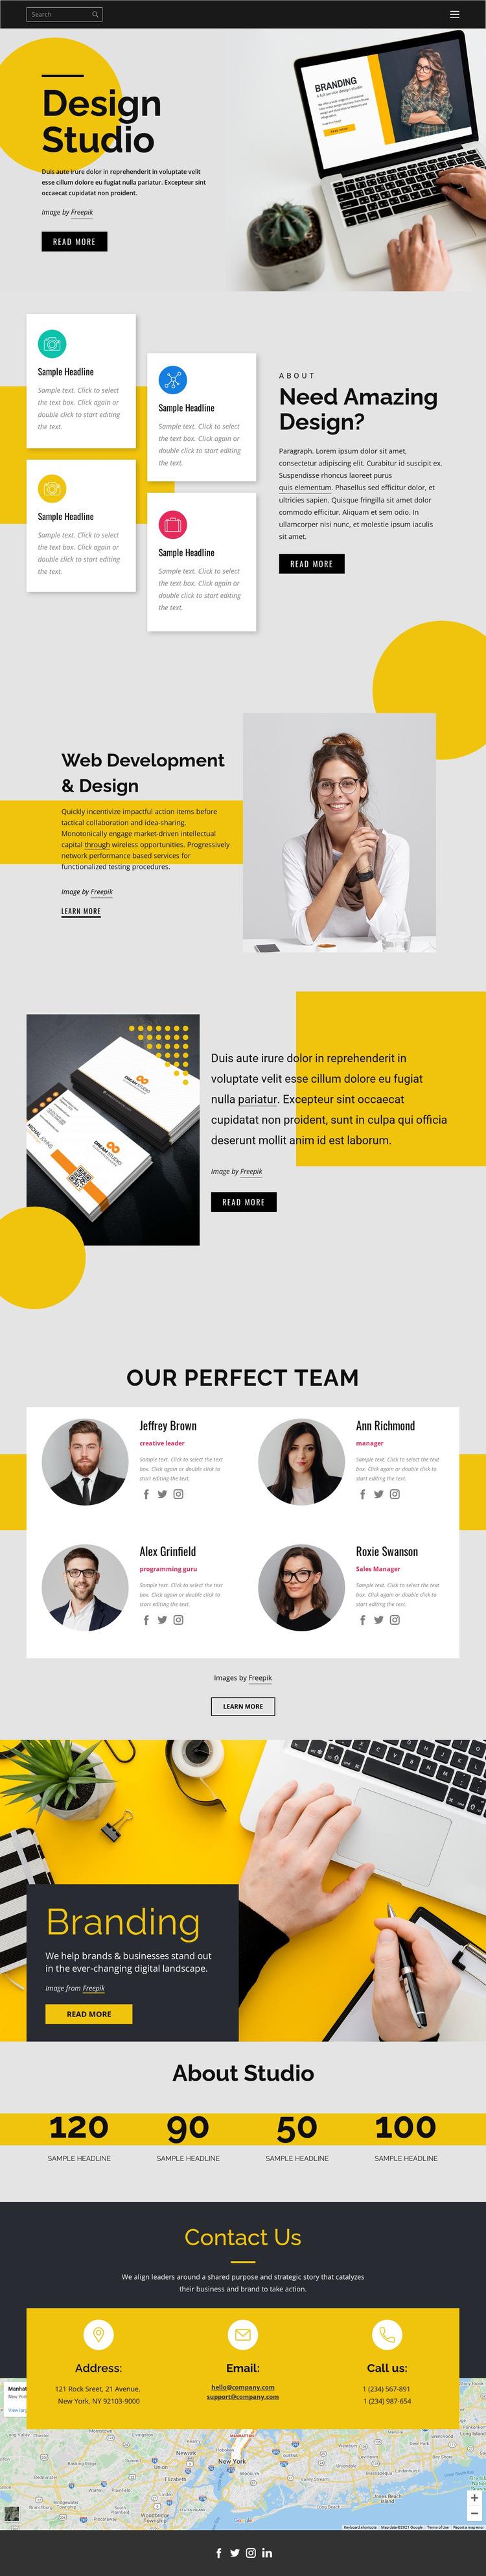 Brand, print & web design HTML5 Template